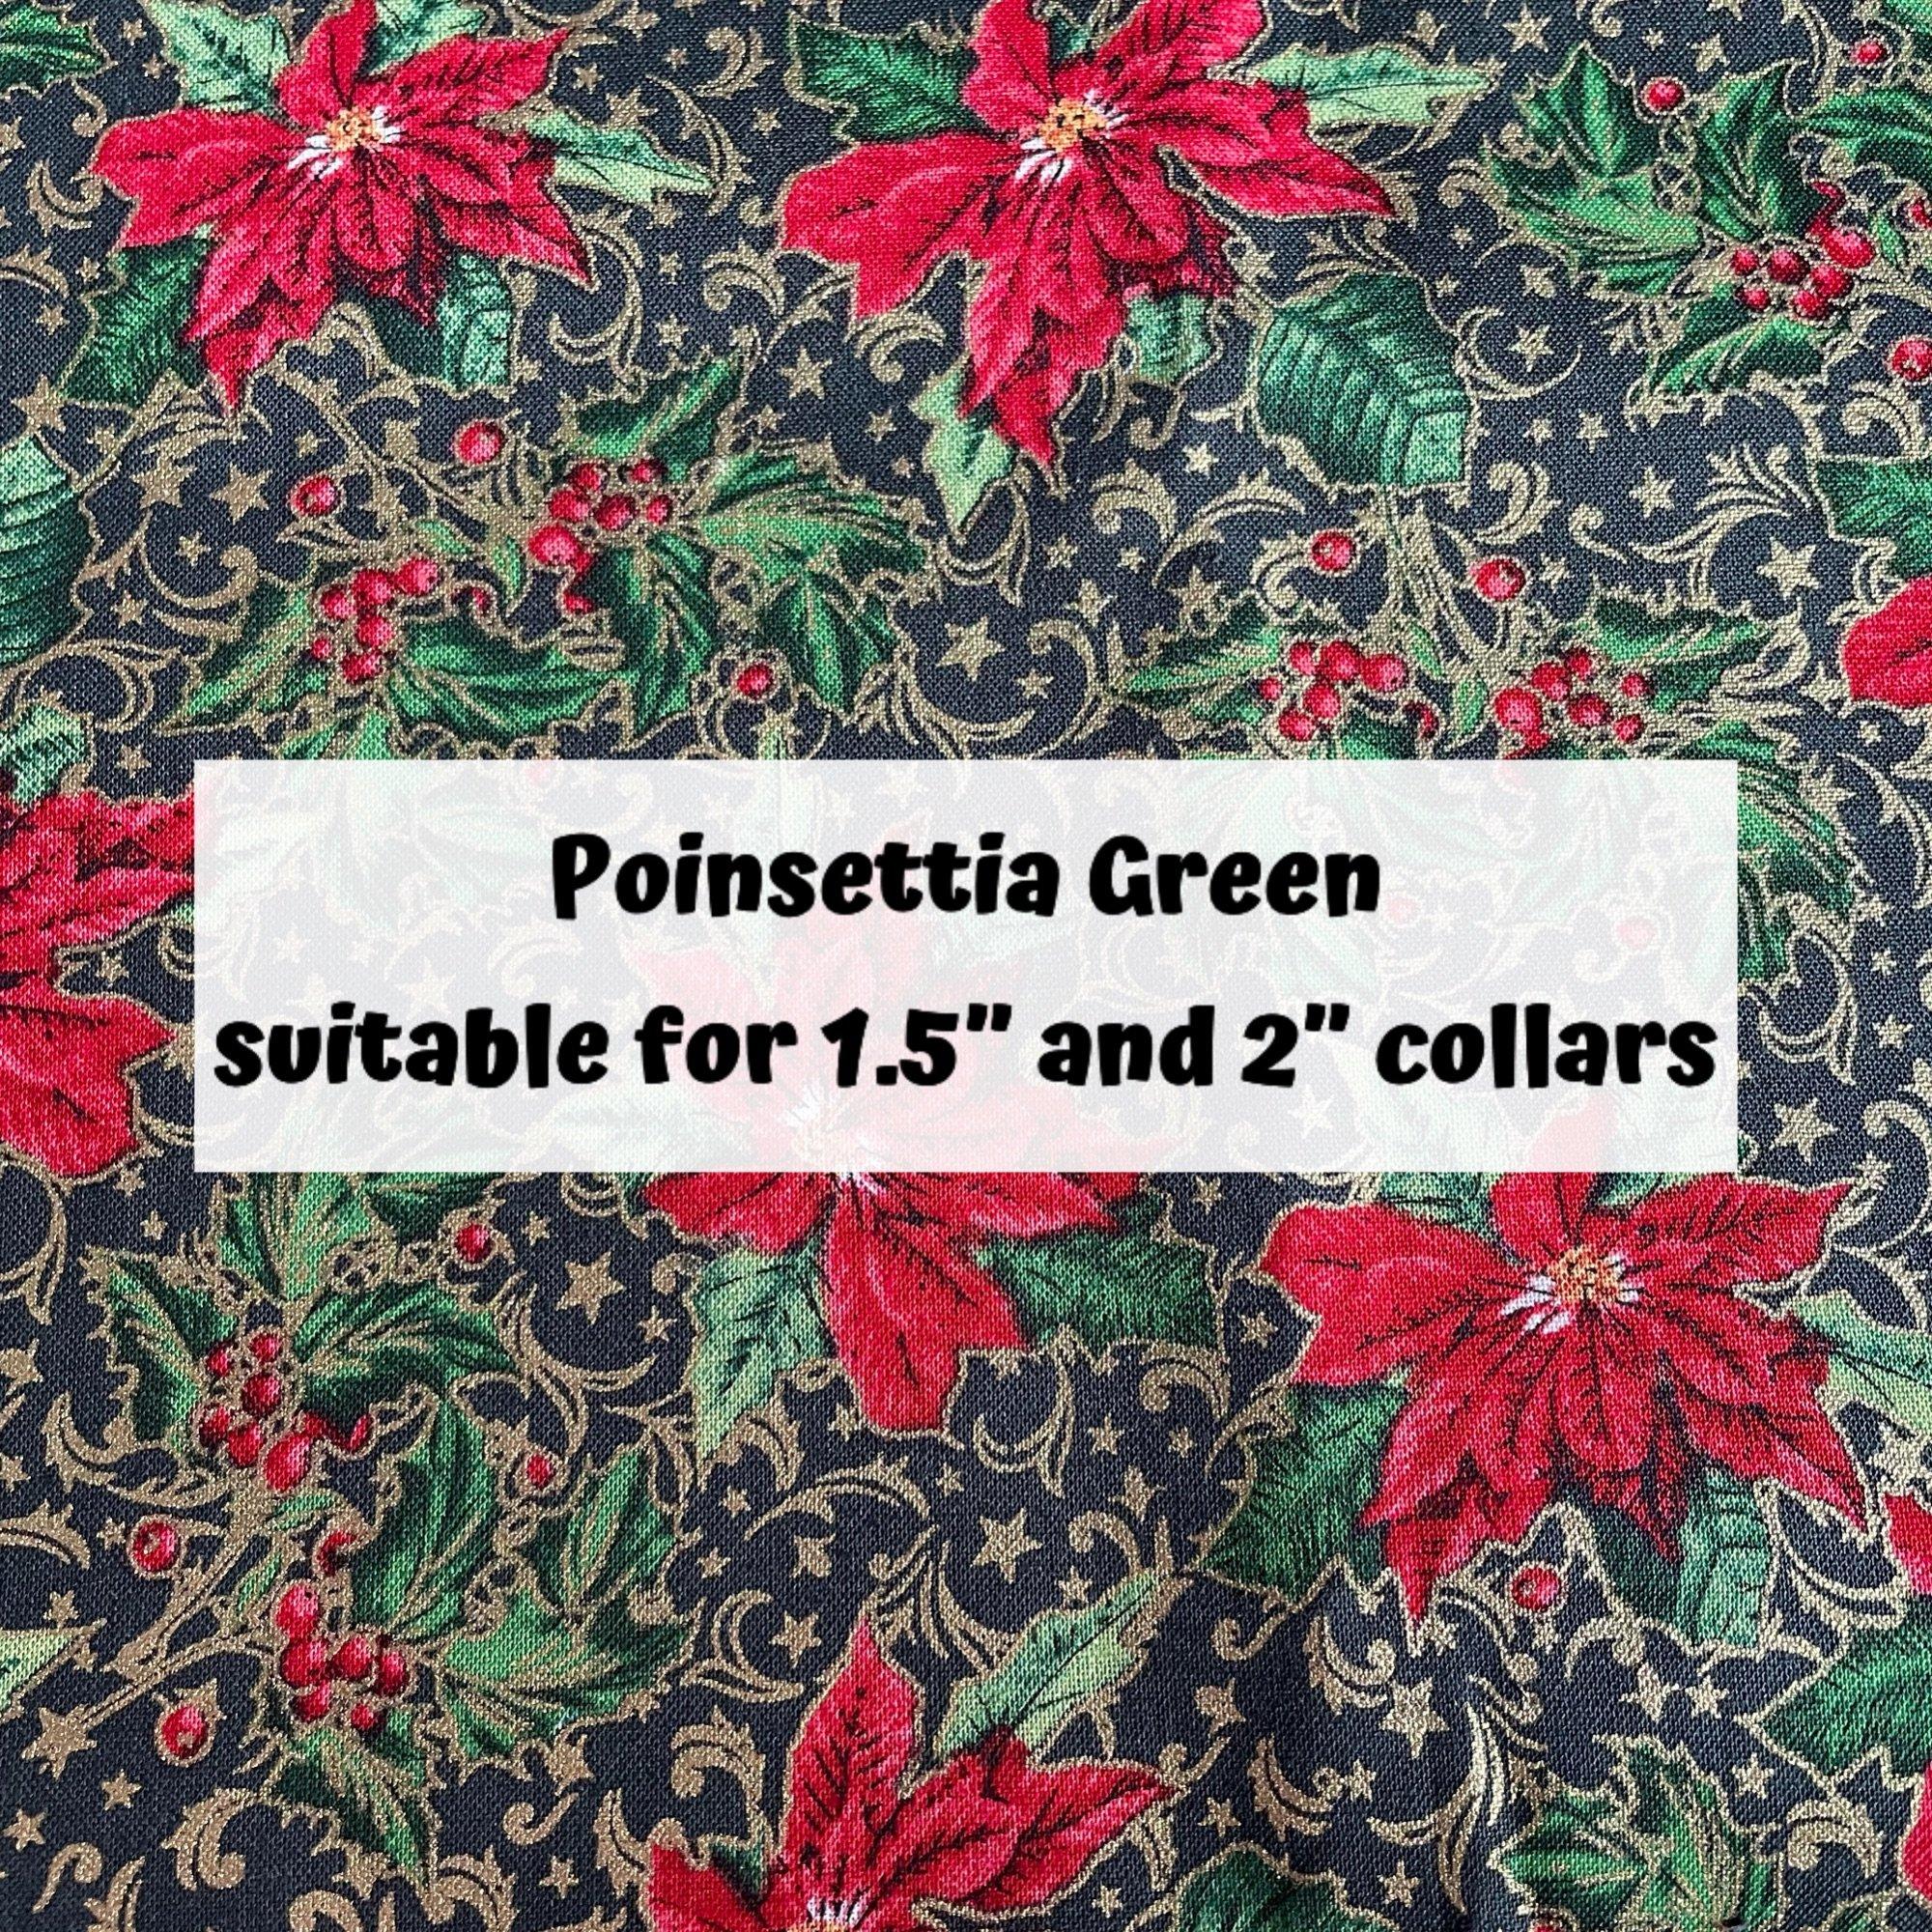 Poinsettia Green